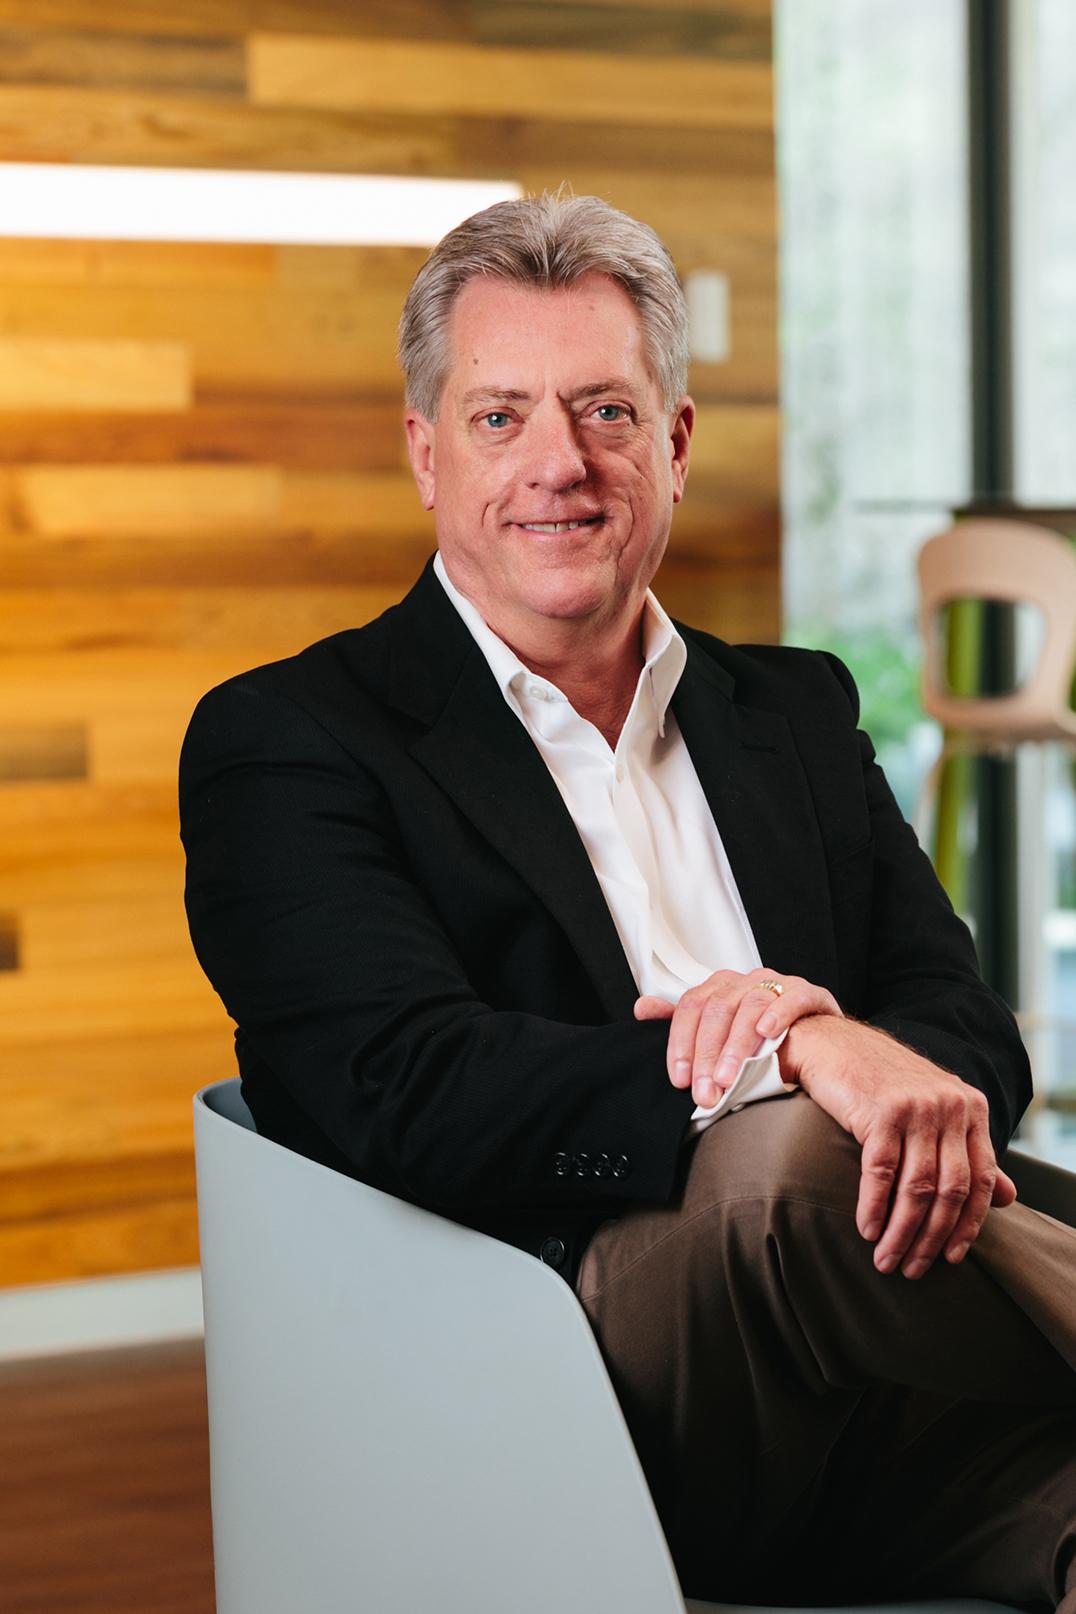 Steven J. Carpenter AIA, NCARB